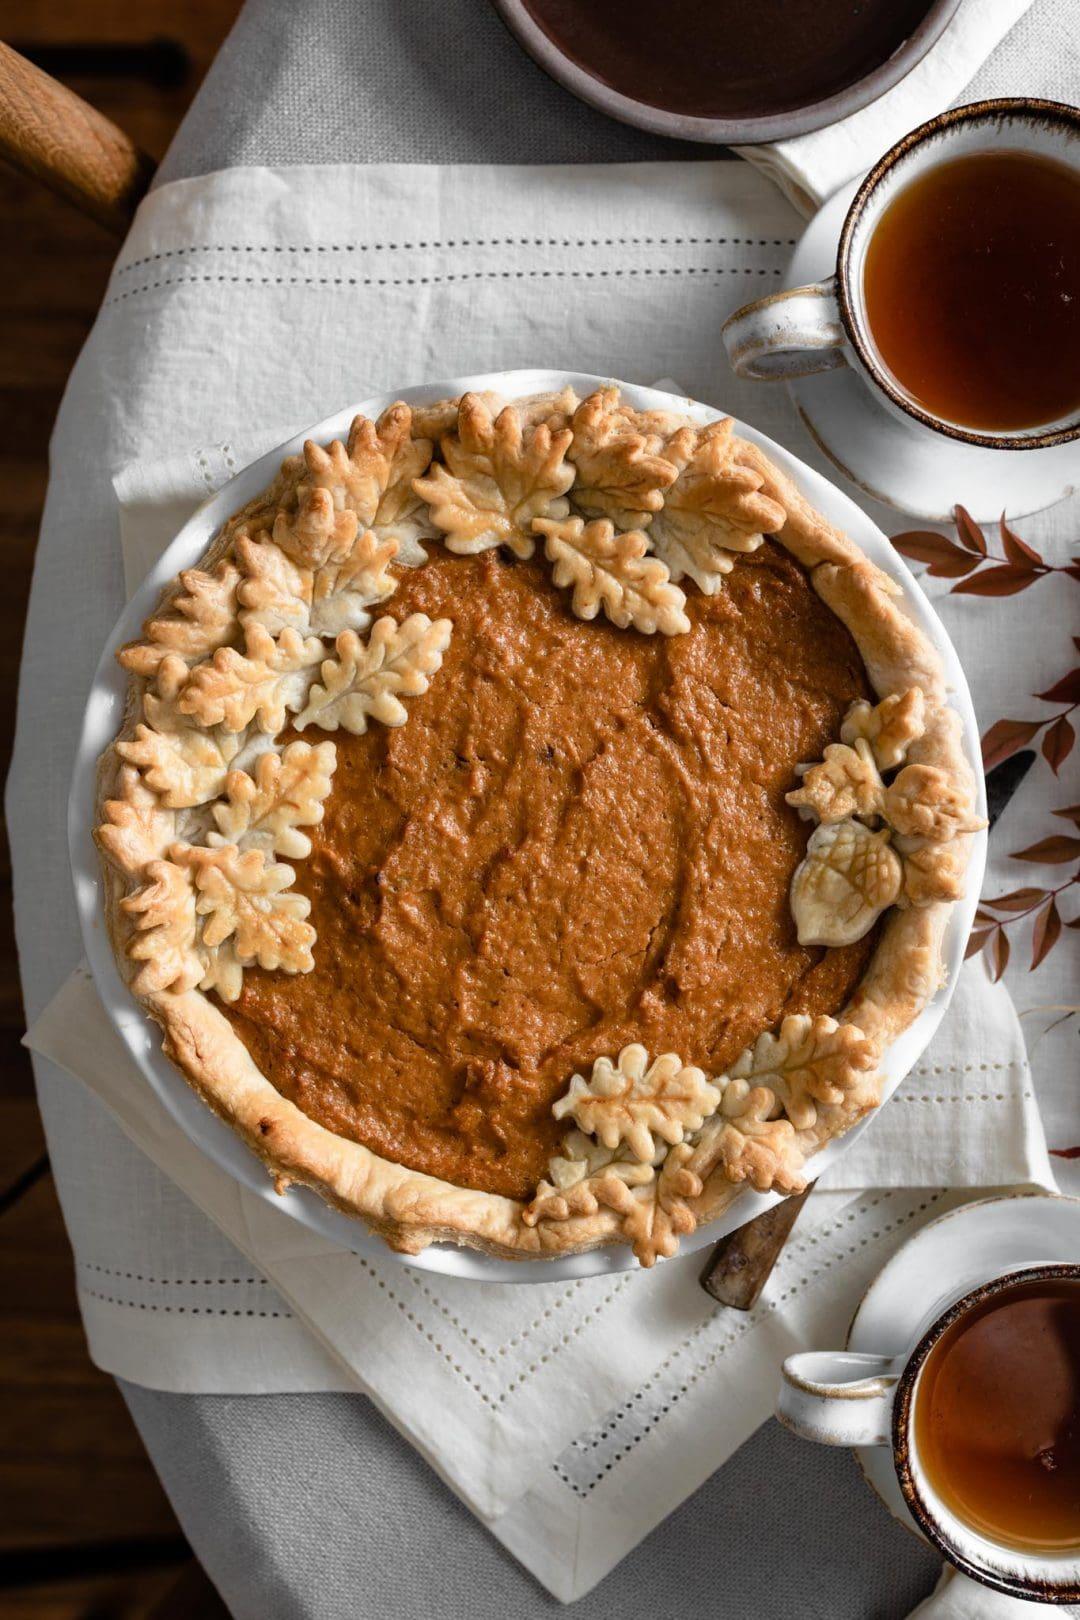 Sweet potato pie made with homemade pie crust